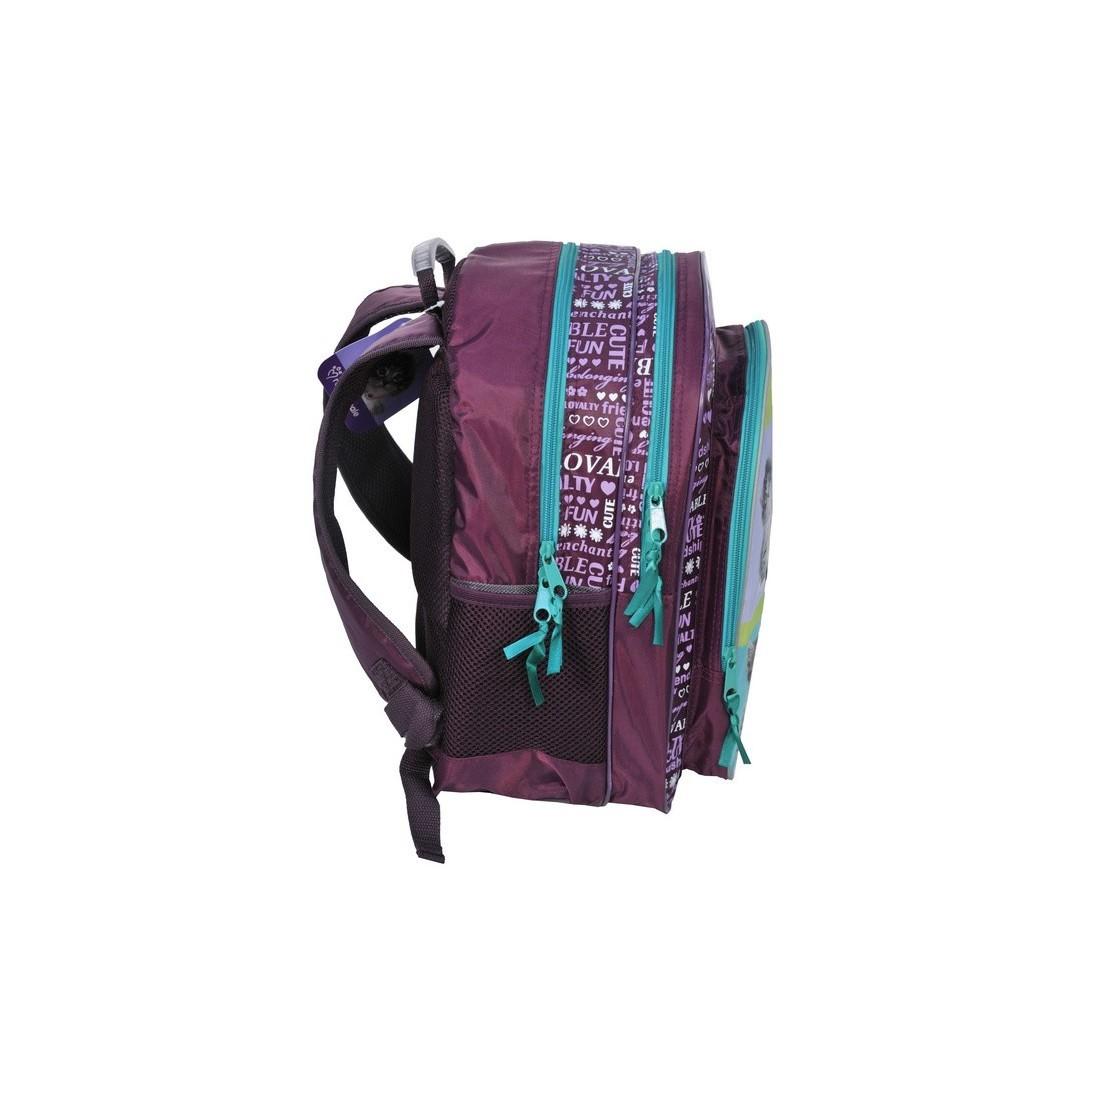 Plecak szkolny Rachael Hale fioletowy z psami - plecak-tornister.pl